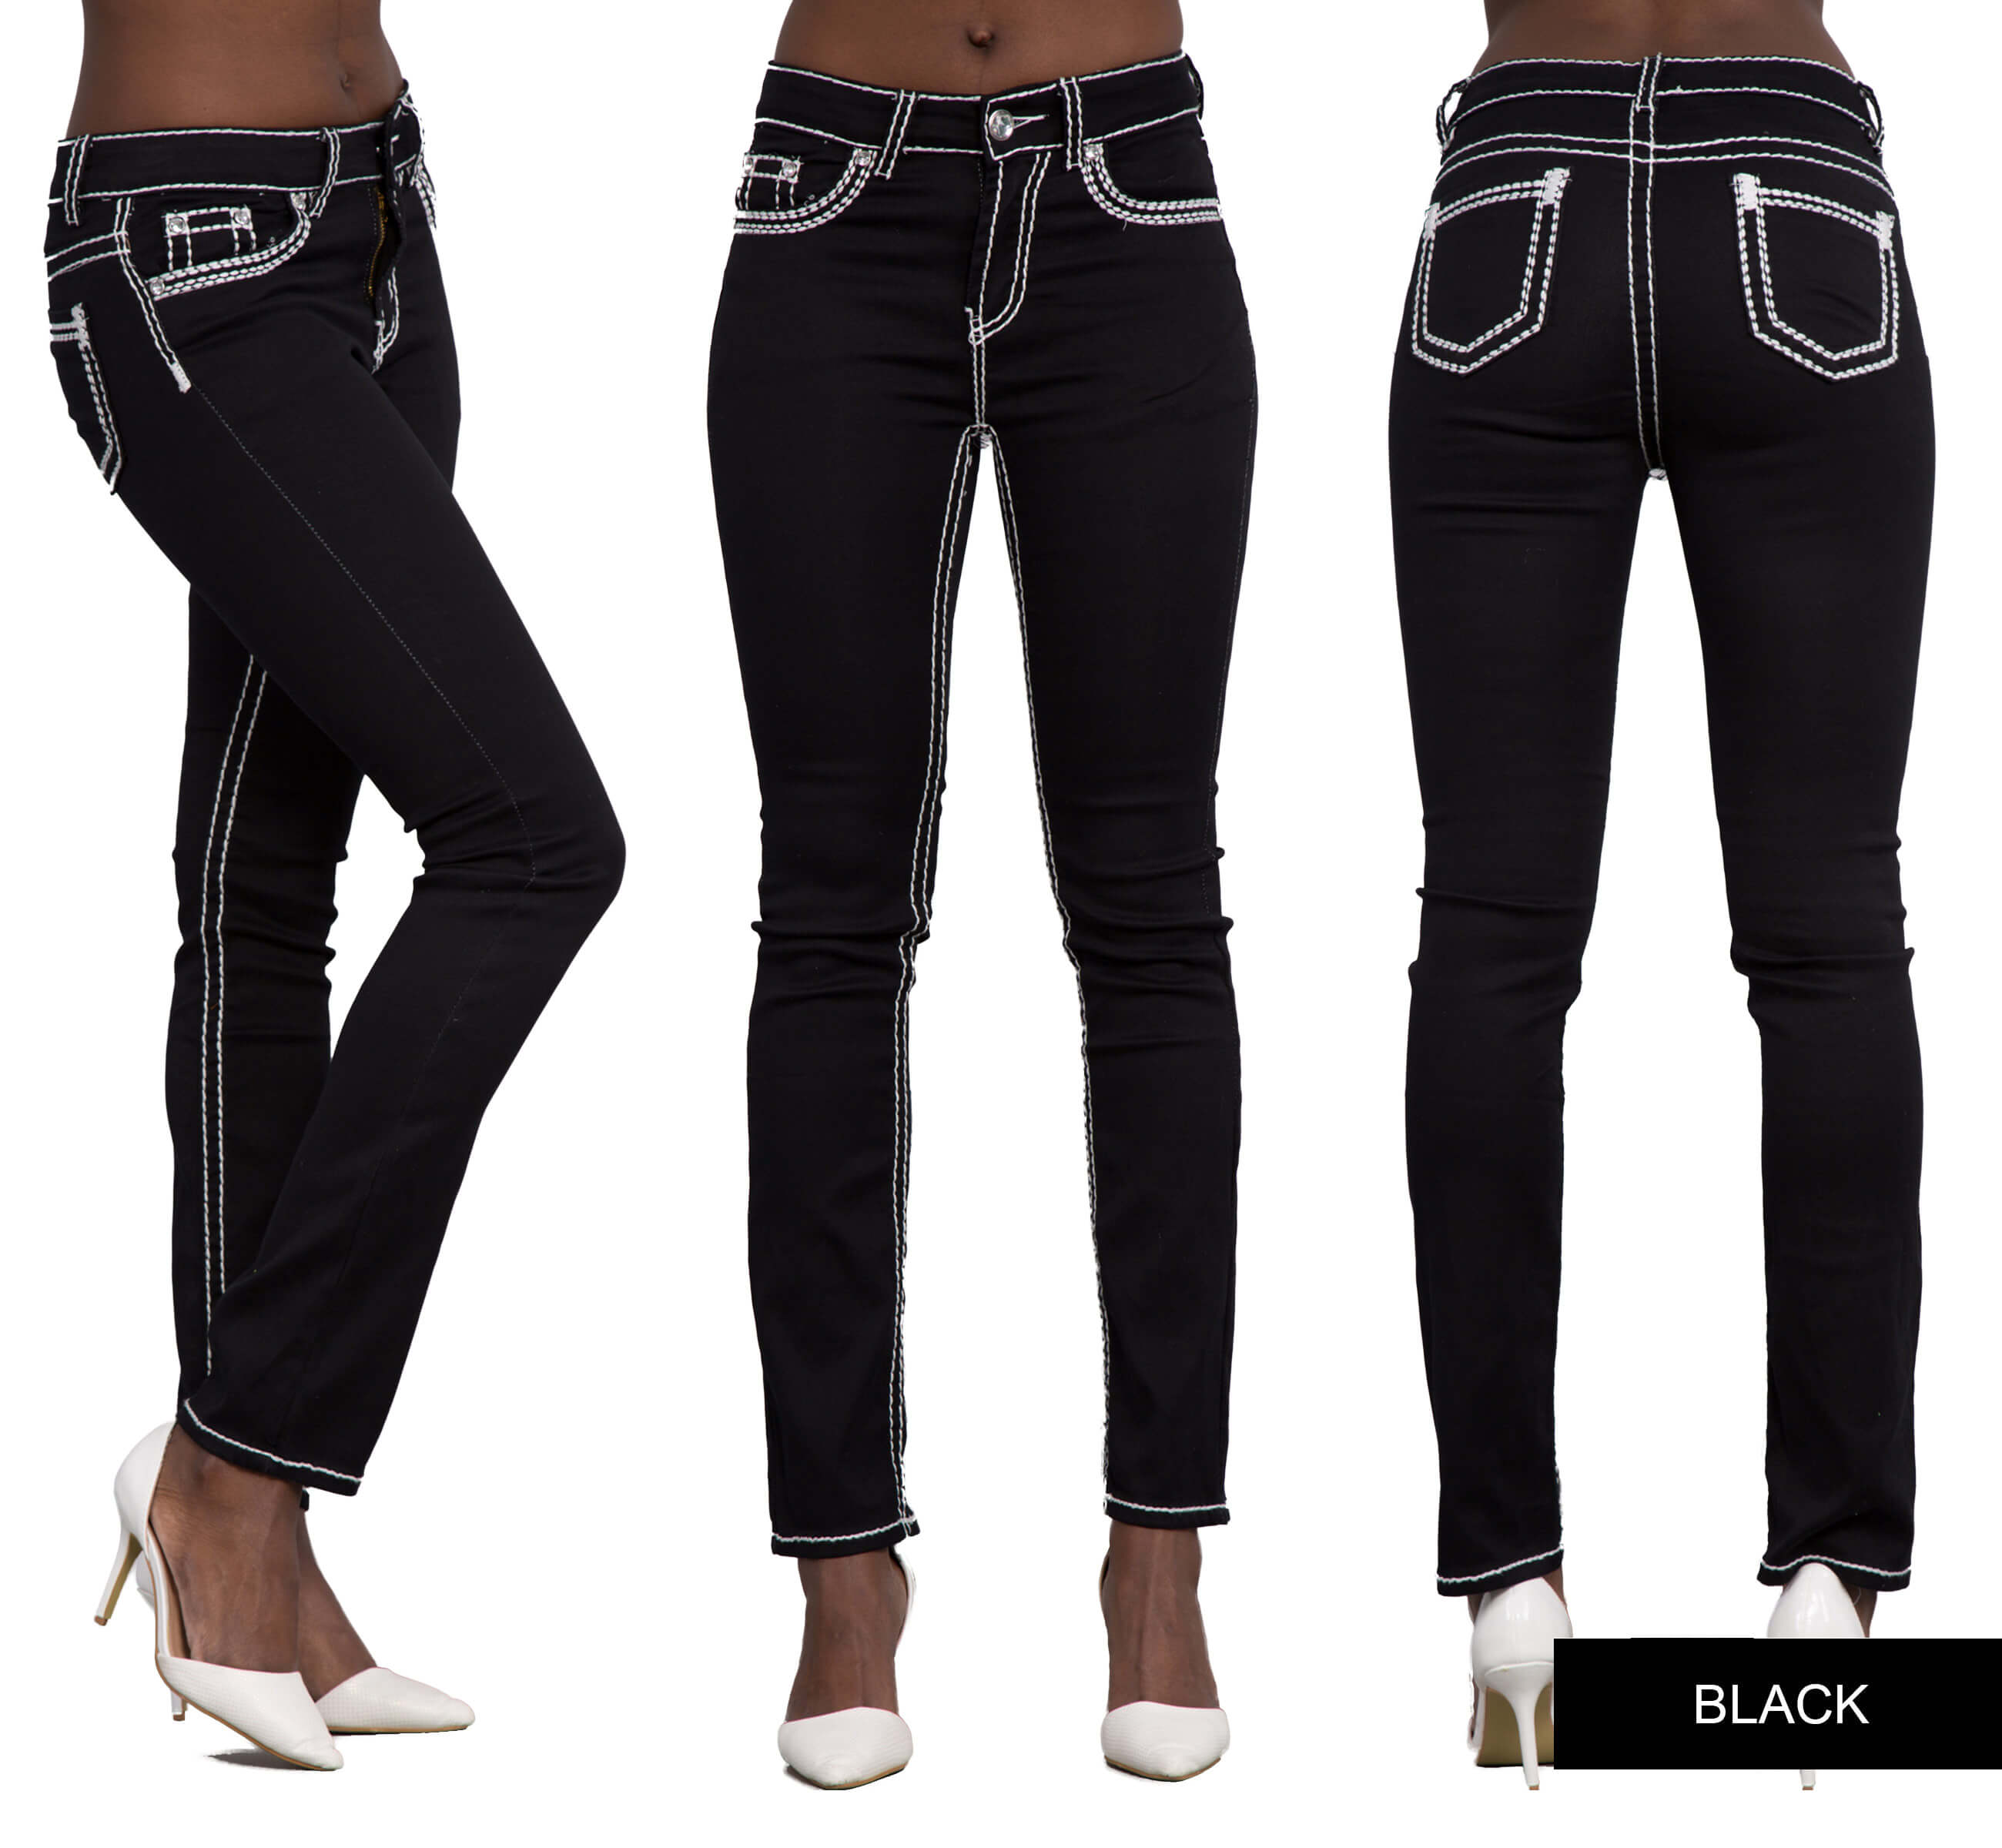 Ladies black blue red mid waist straight cut jeans size 8 10 12 14 16